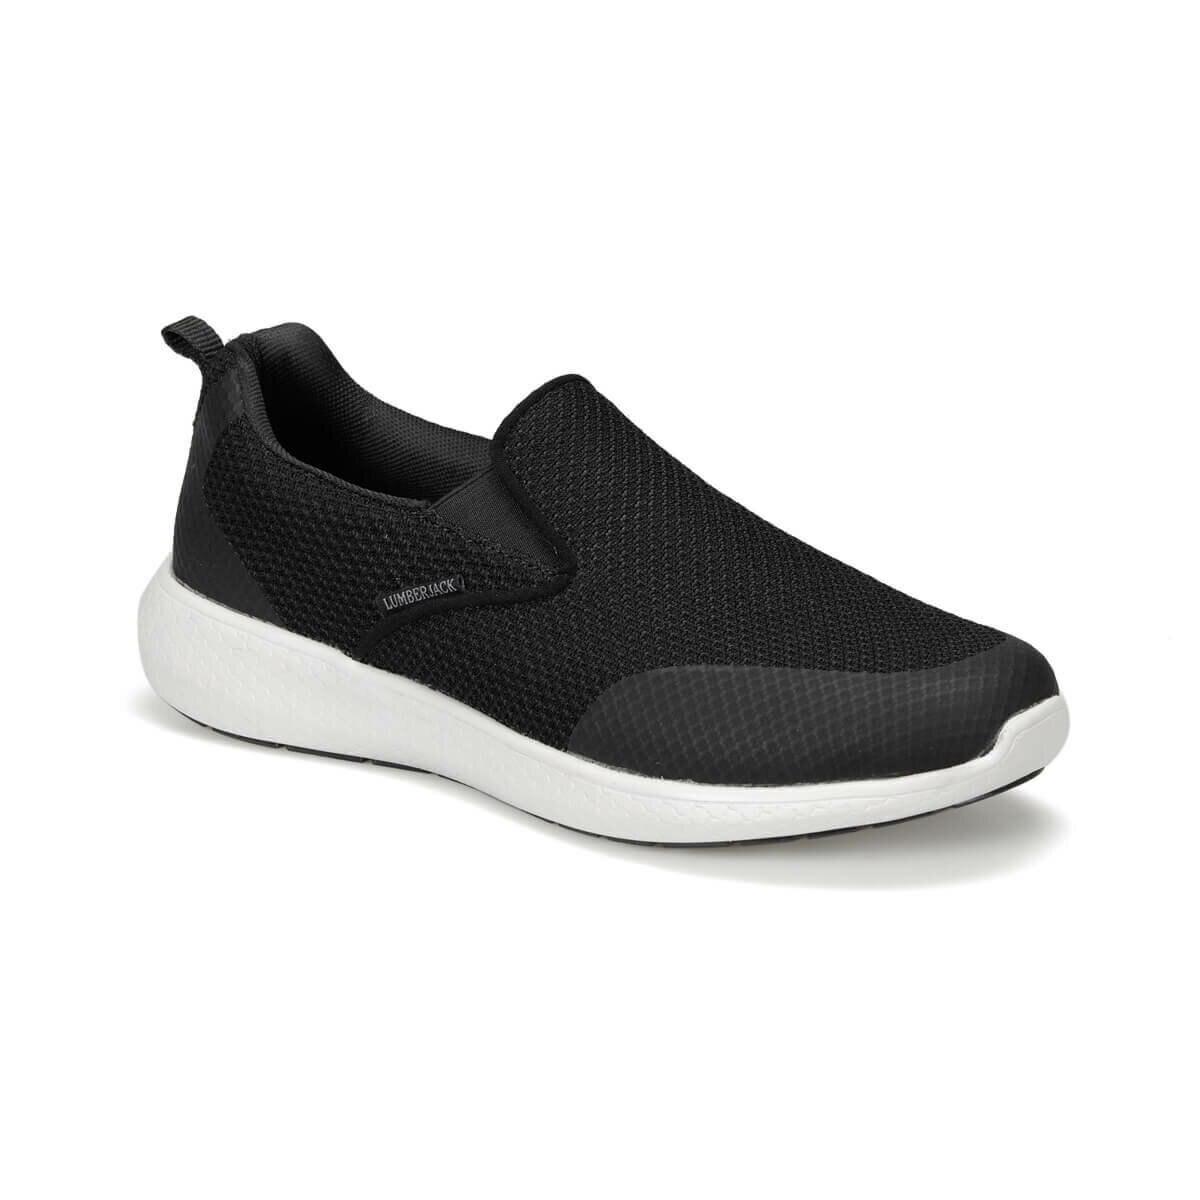 FLO JARED 9PR Black Slip On Shoes LUMBERJACK